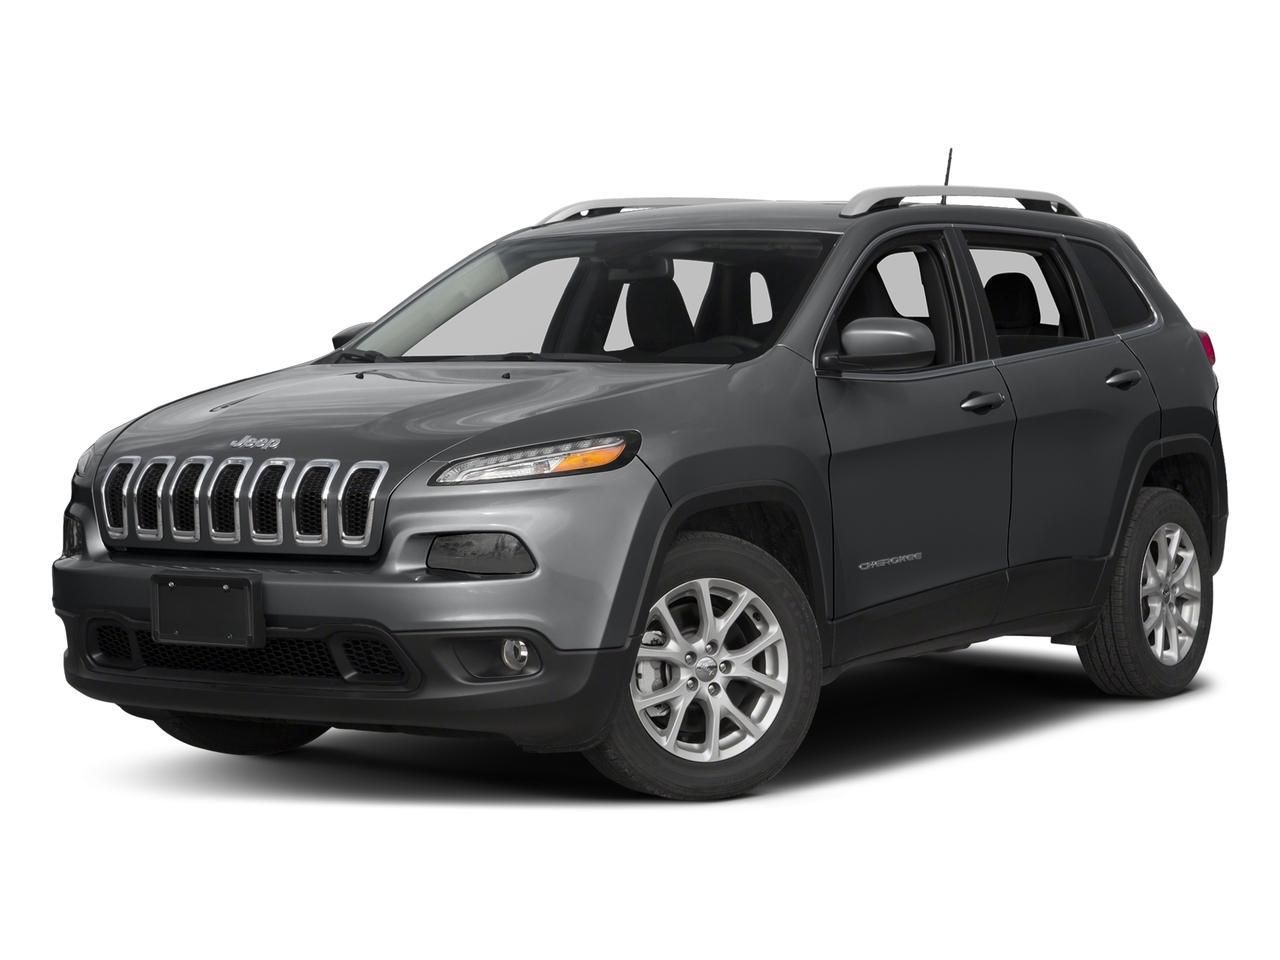 2016 Jeep Cherokee Vehicle Photo in Shreveport, LA 71105